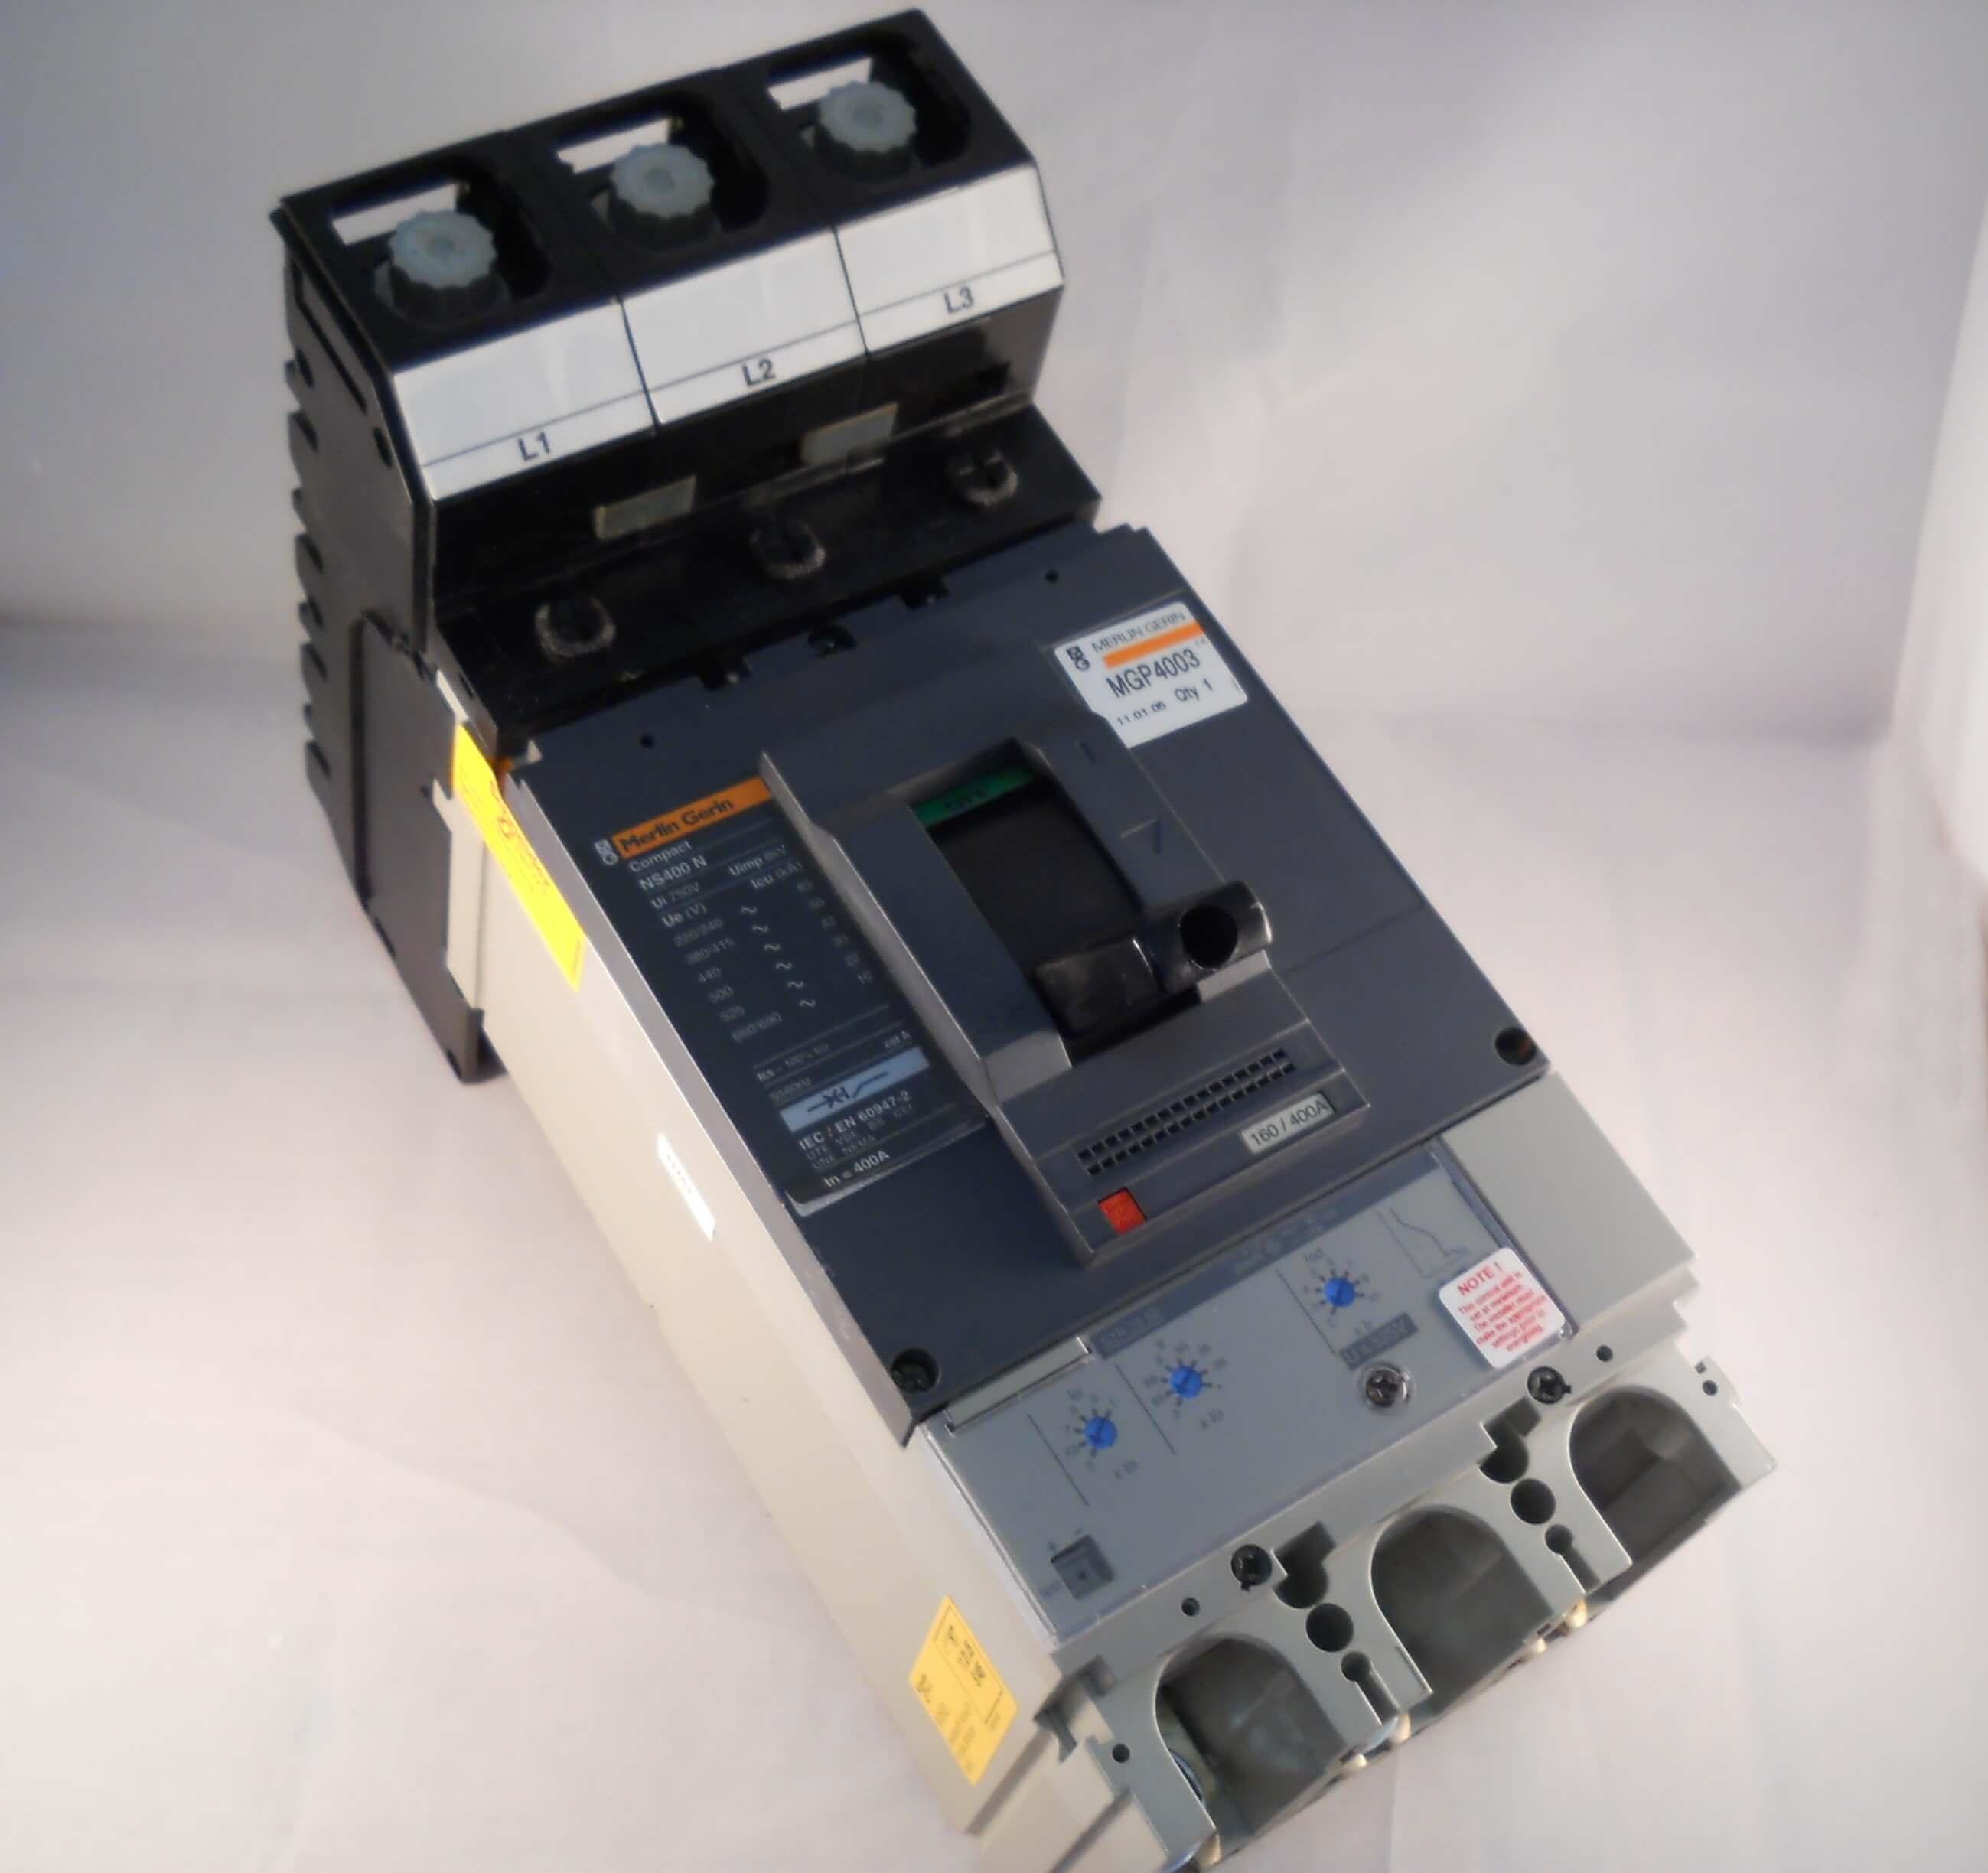 STR23-SE Trip MERLIN GERIN 8kV CIRCUIT BREAKER 400amp 3 Pole NS400N